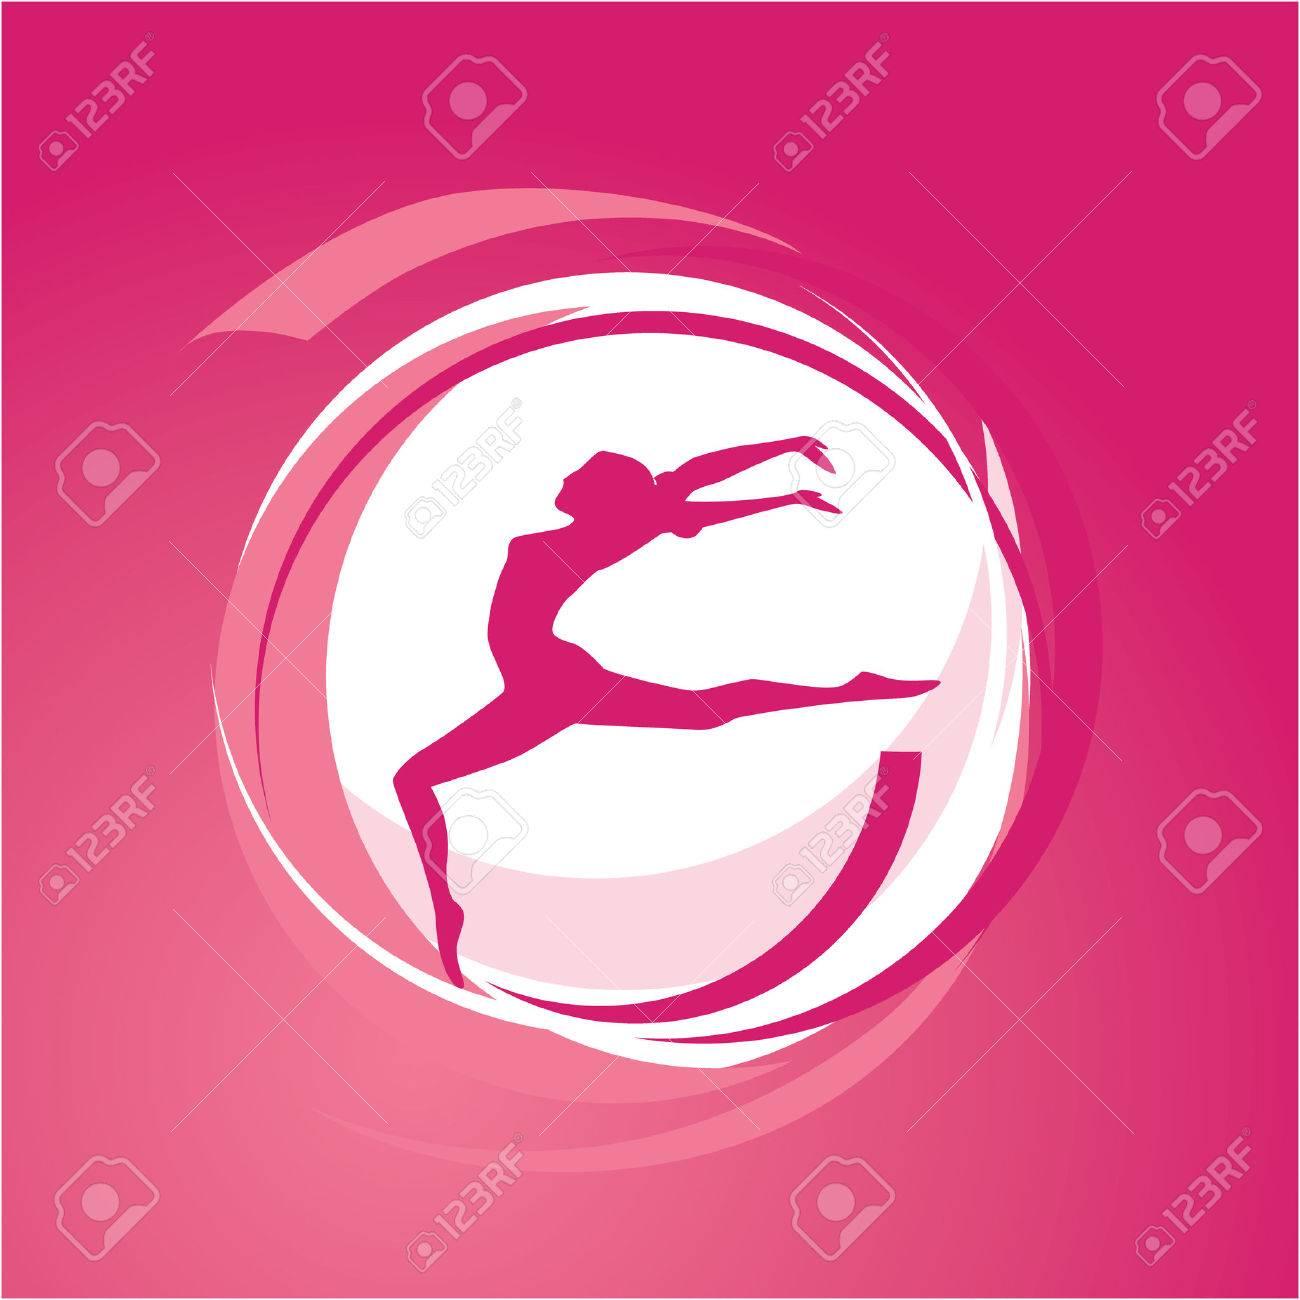 Sport theme - Woman gymnastics silhouette on the move illustration Stock Vector - 6051219